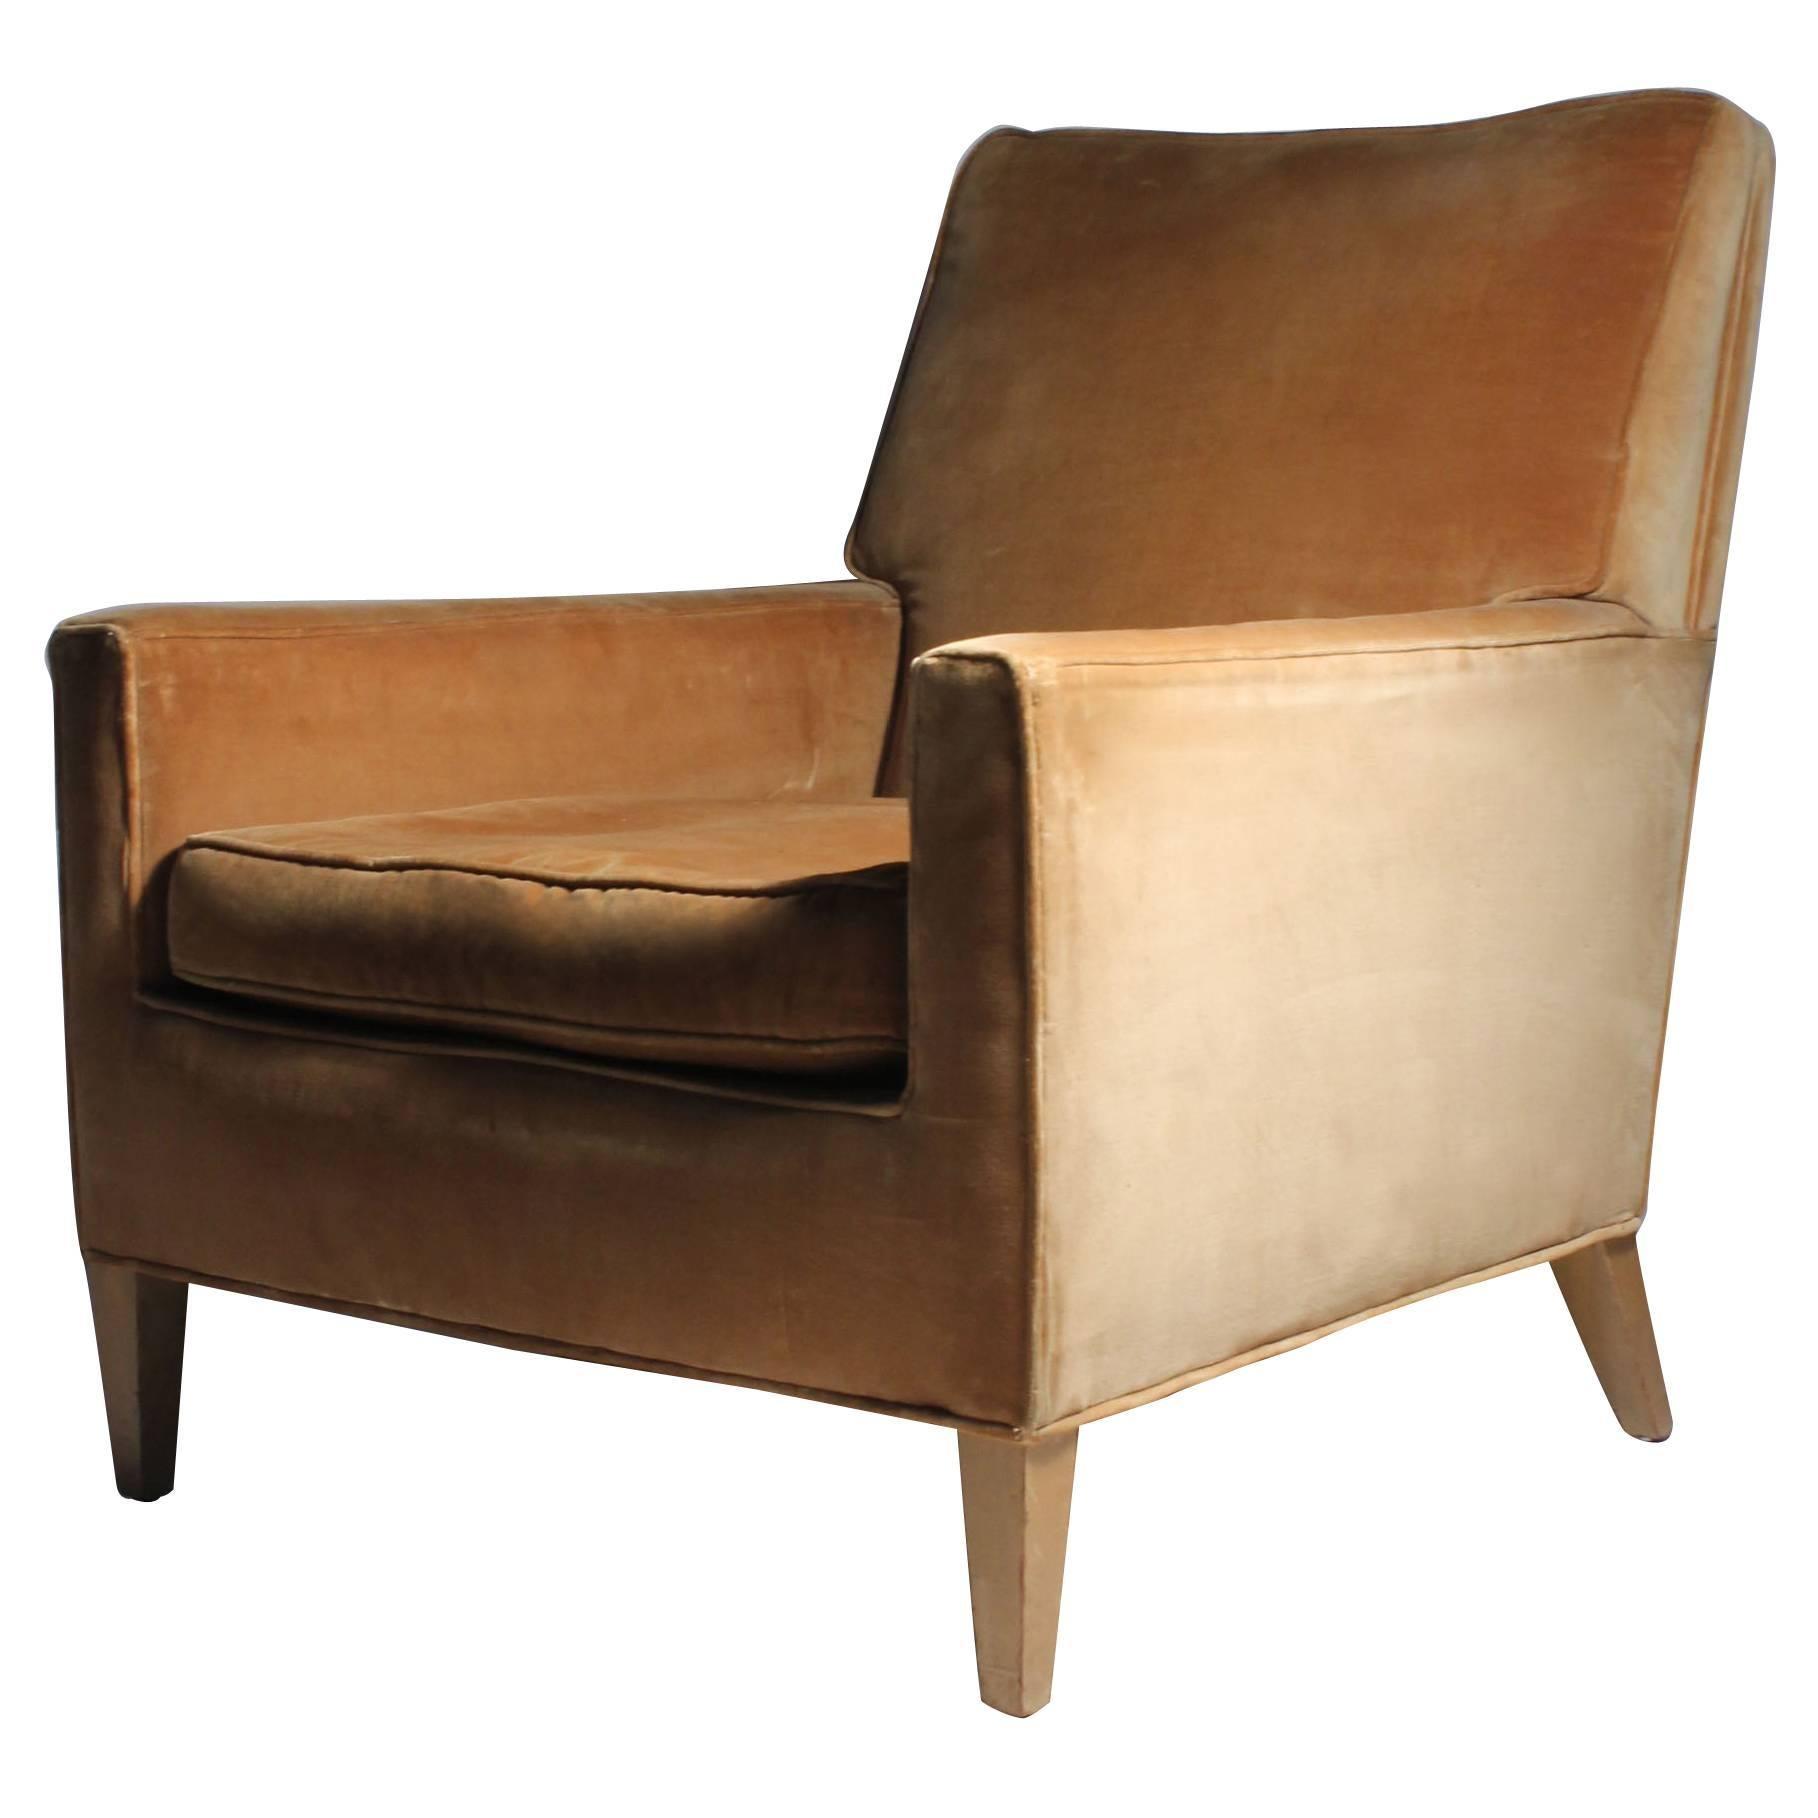 Vintage Robsjohn-Gibbings Lounge Chair